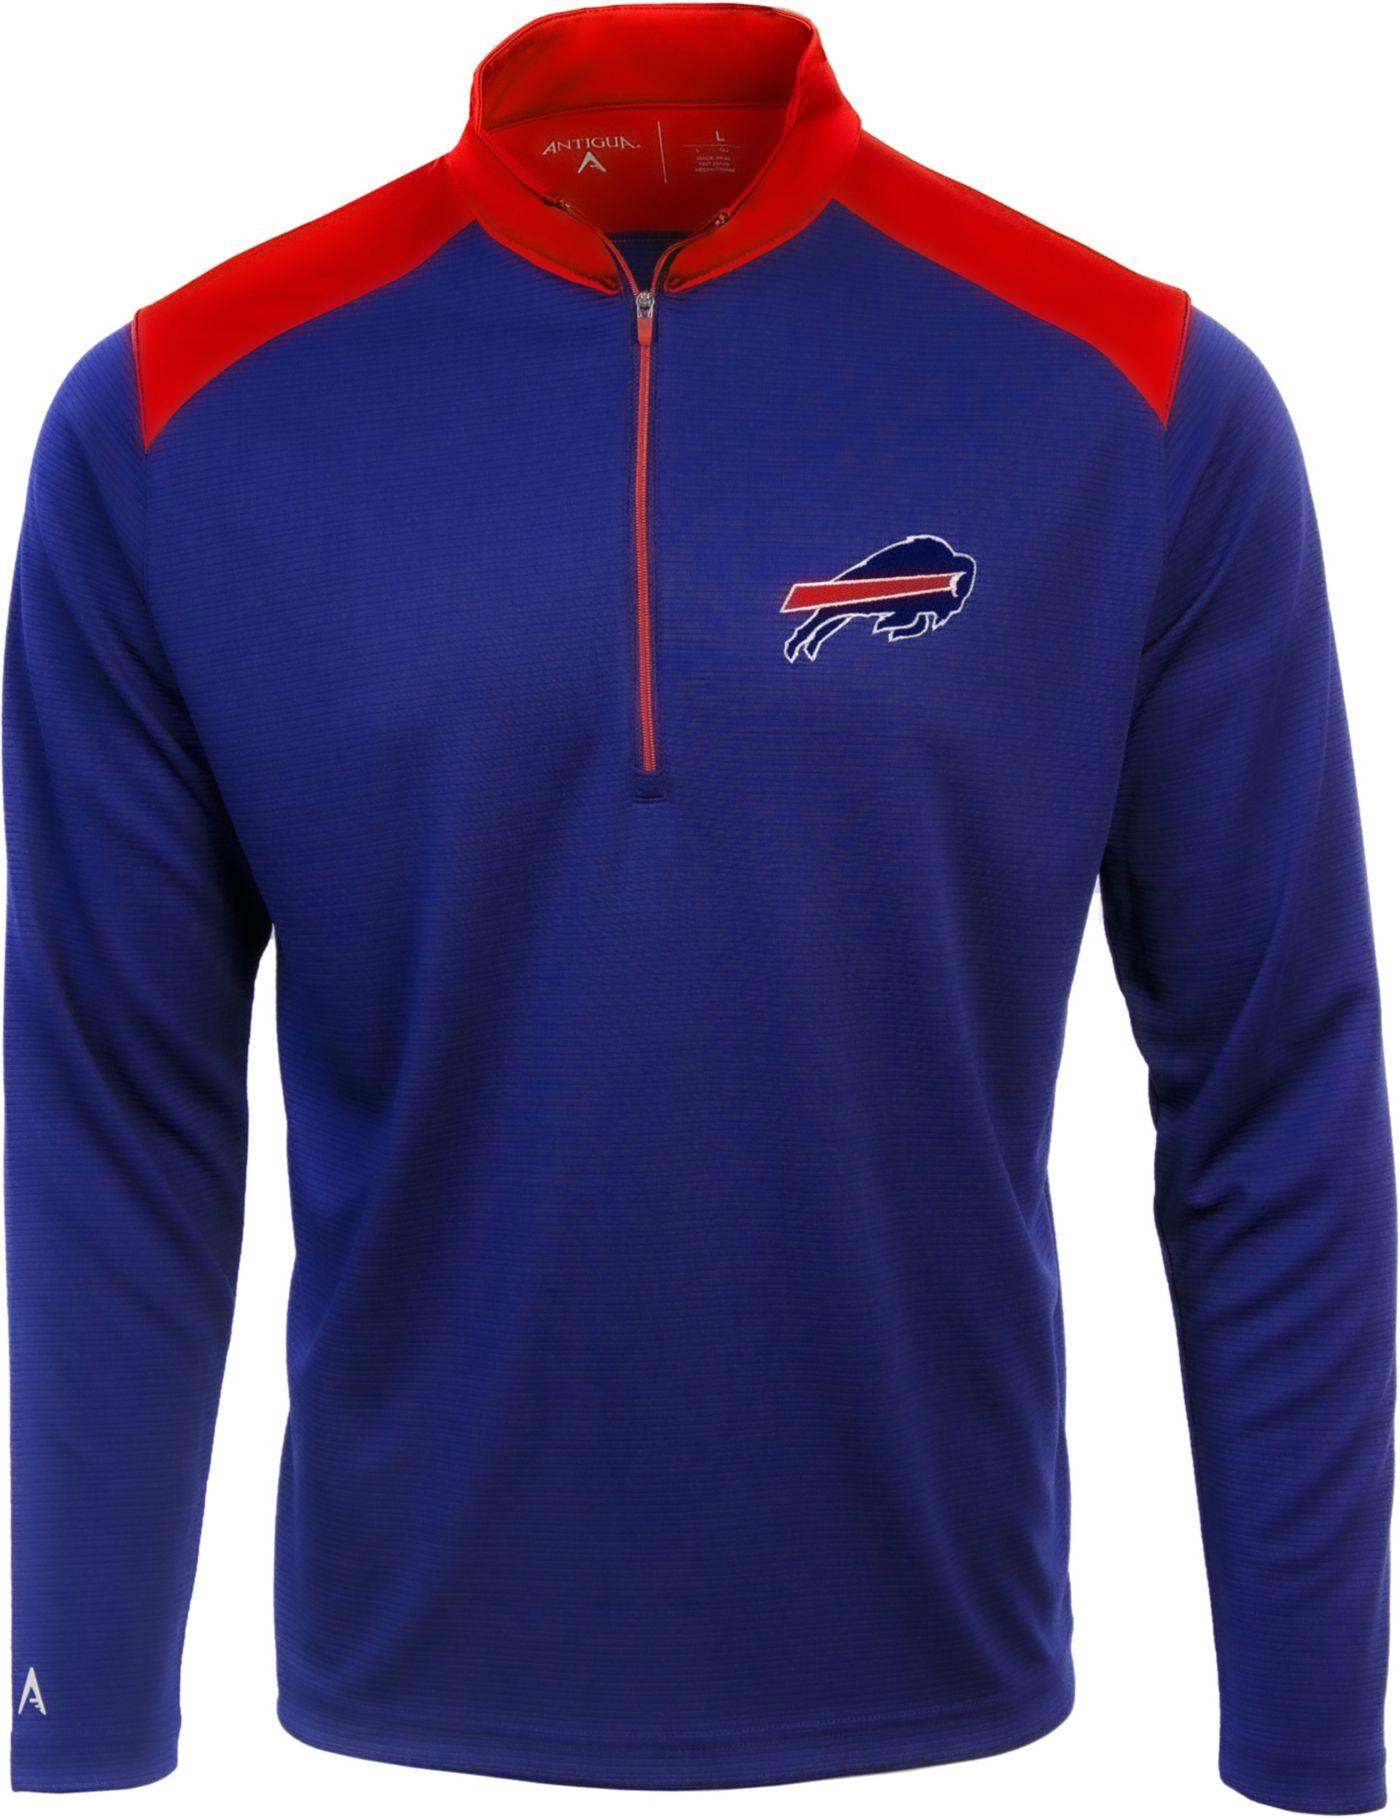 Antigua Men's Buffalo Bills Velocity Royal Quarter-Zip Pullover